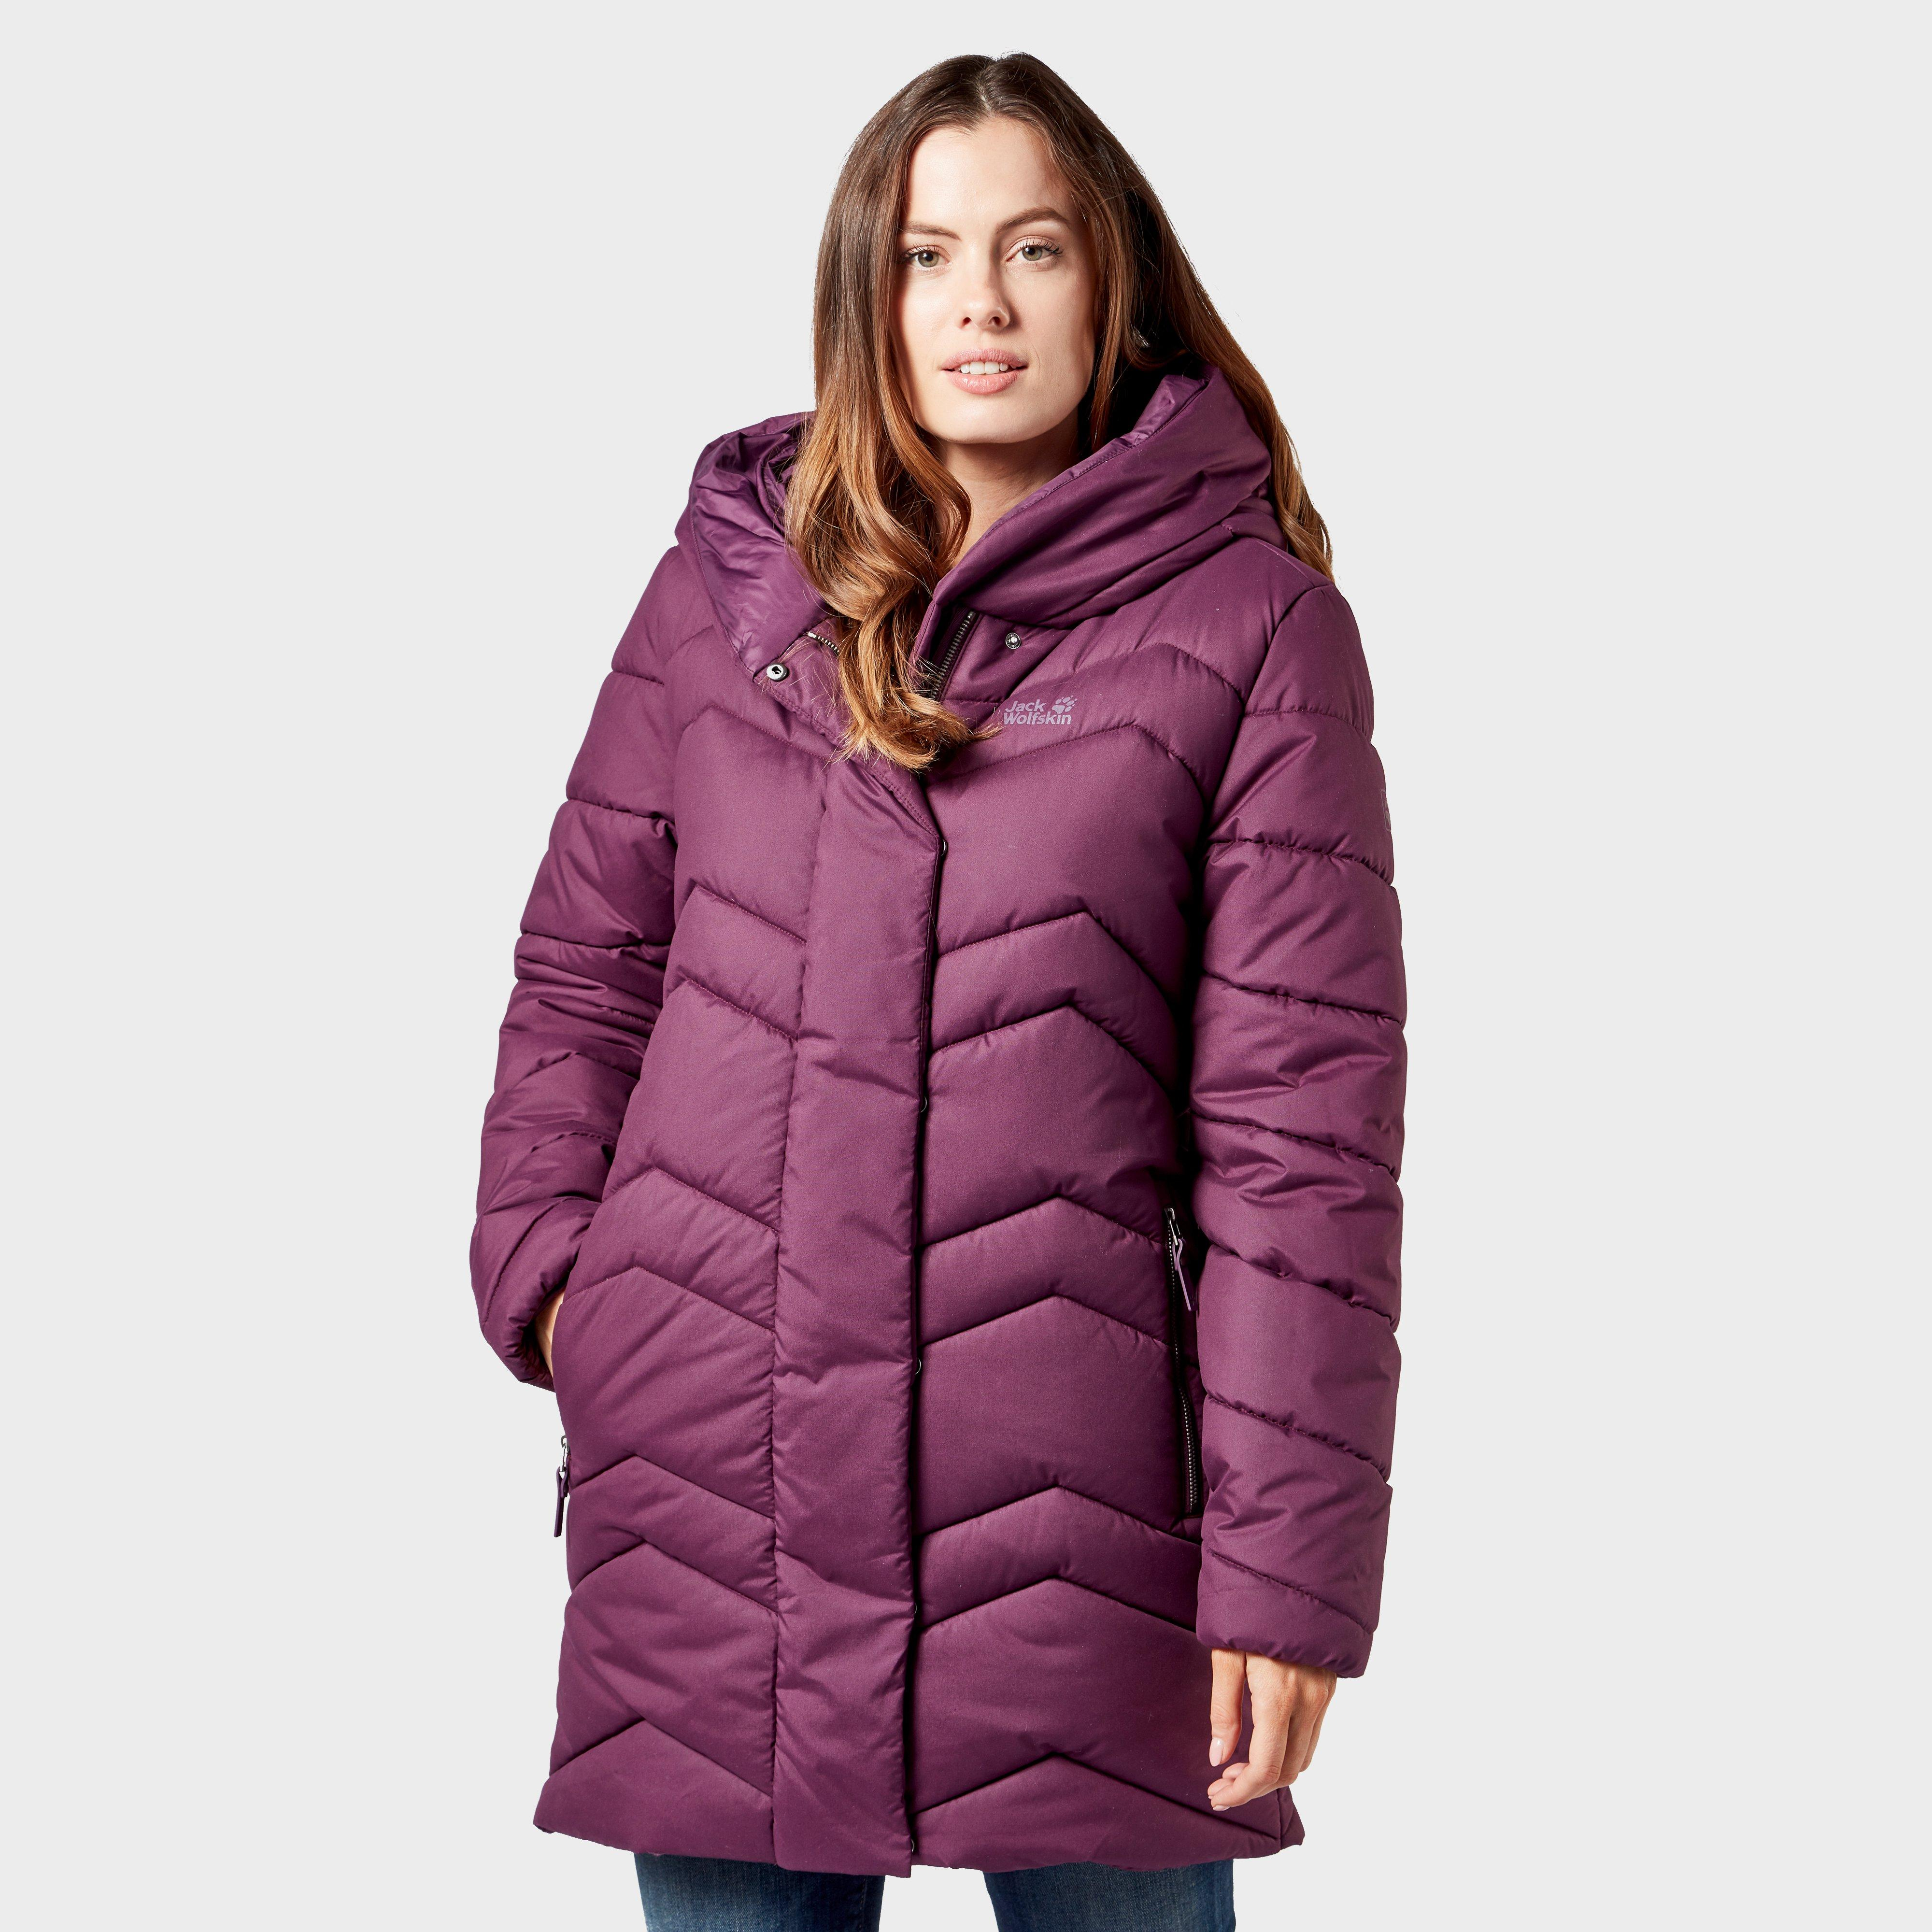 Jack Wolfskin Jack Wolfskin womens Kyoto Long Jacket - Purple, Purple